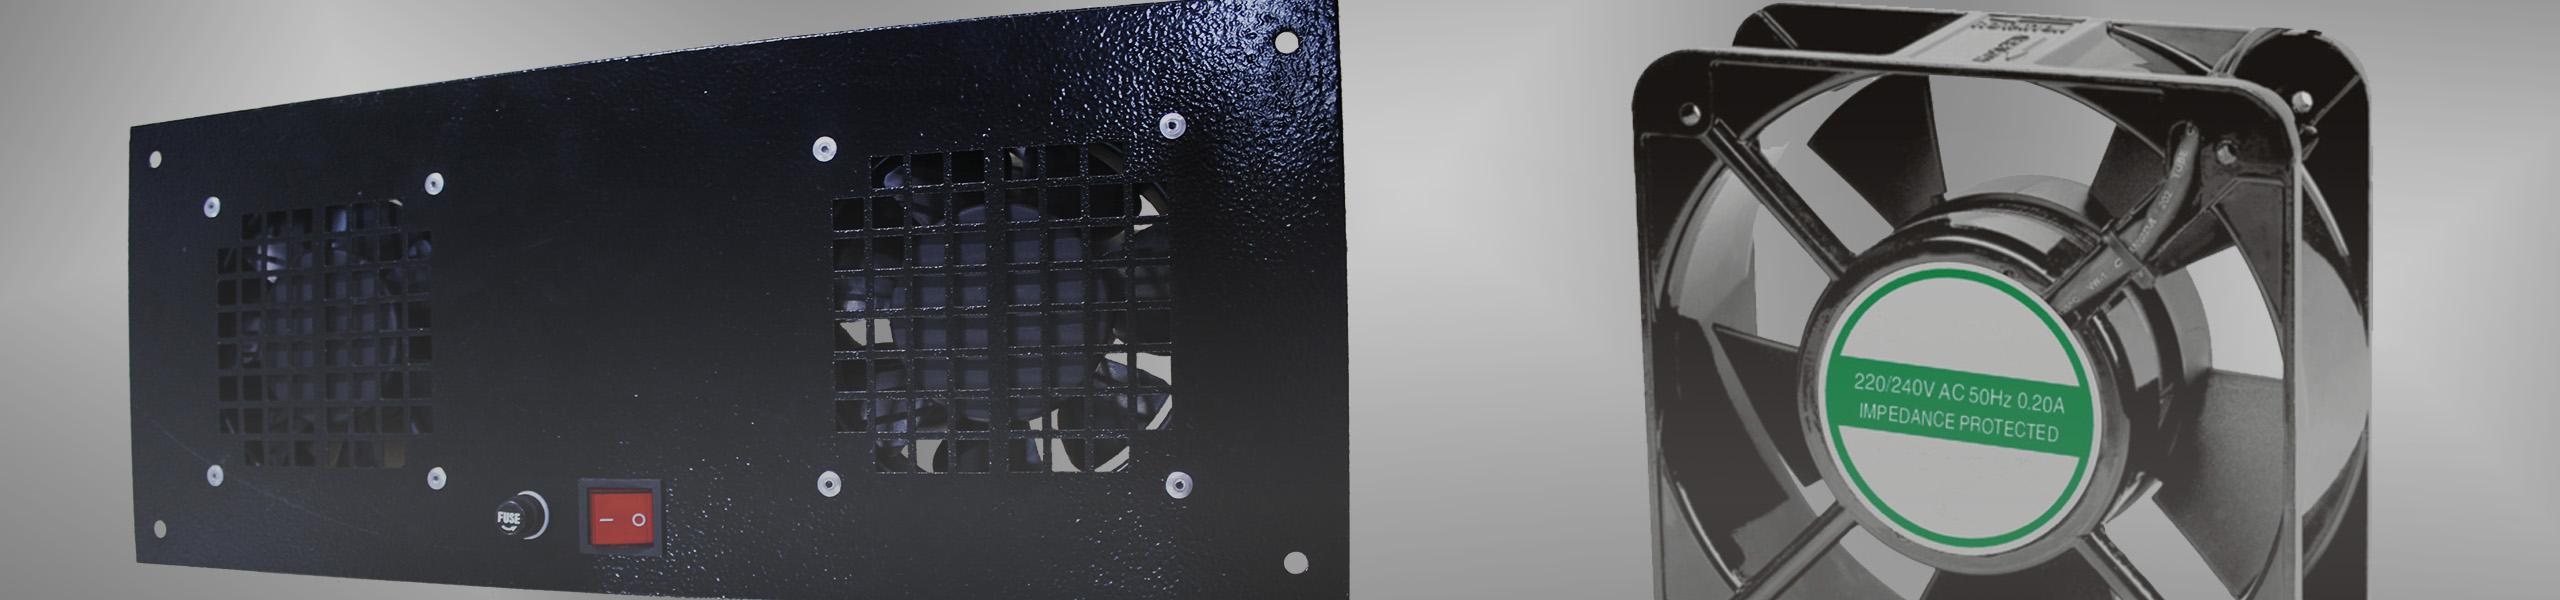 banner_superior_tecniases_accesorios_fan_panel_axial_fan_panel_de_ventilacion_para_gabinetes